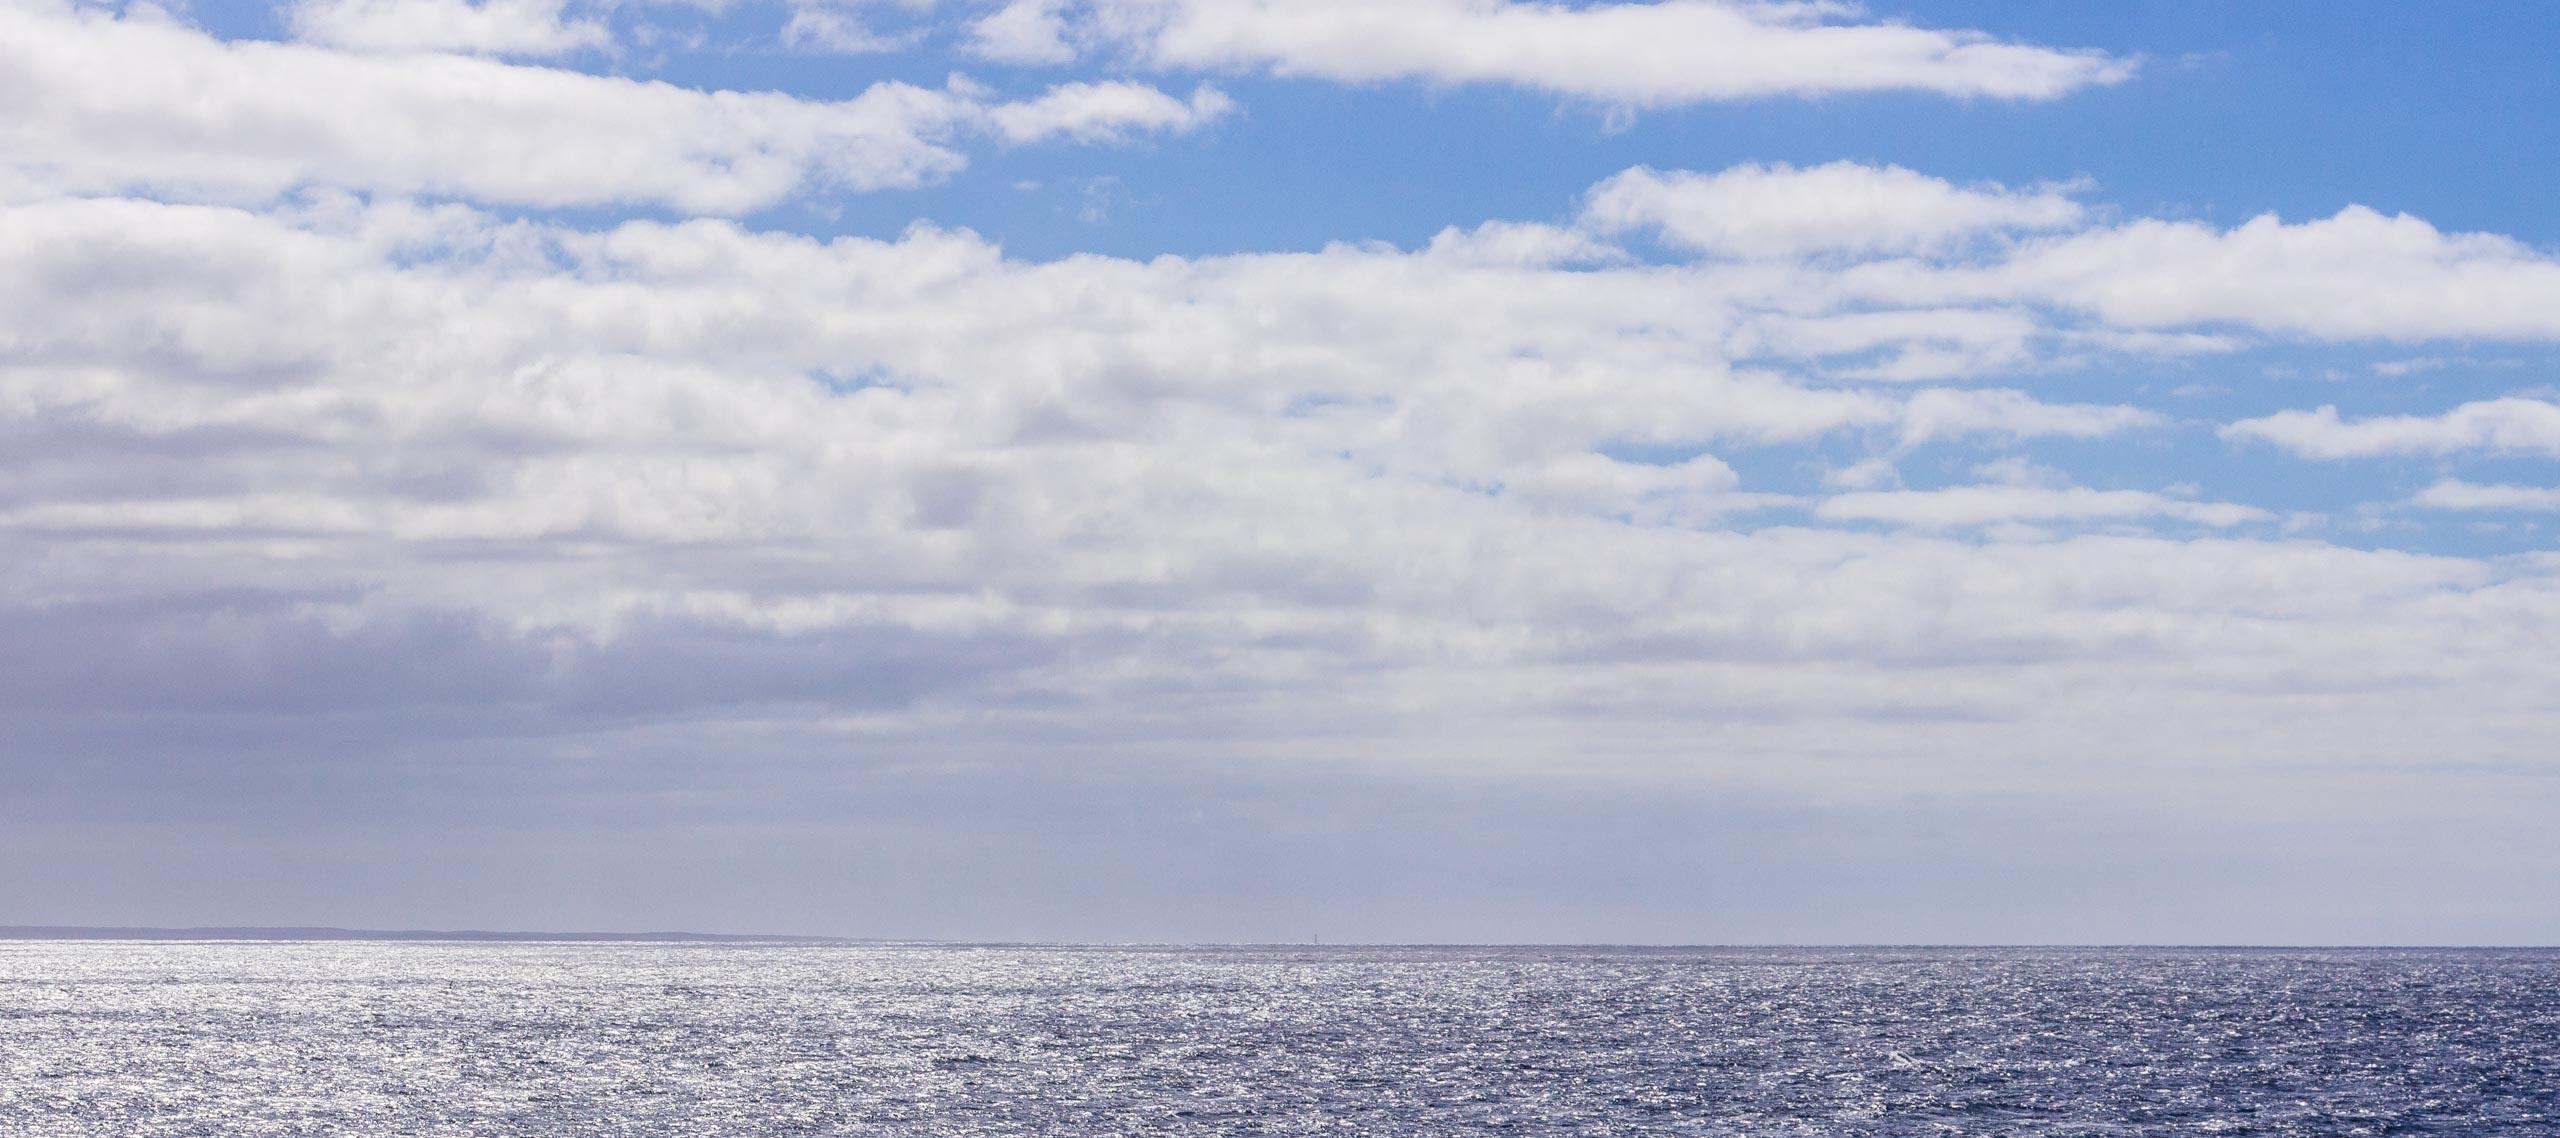 2014 02 Lanzarote PuntaPechiguera 002